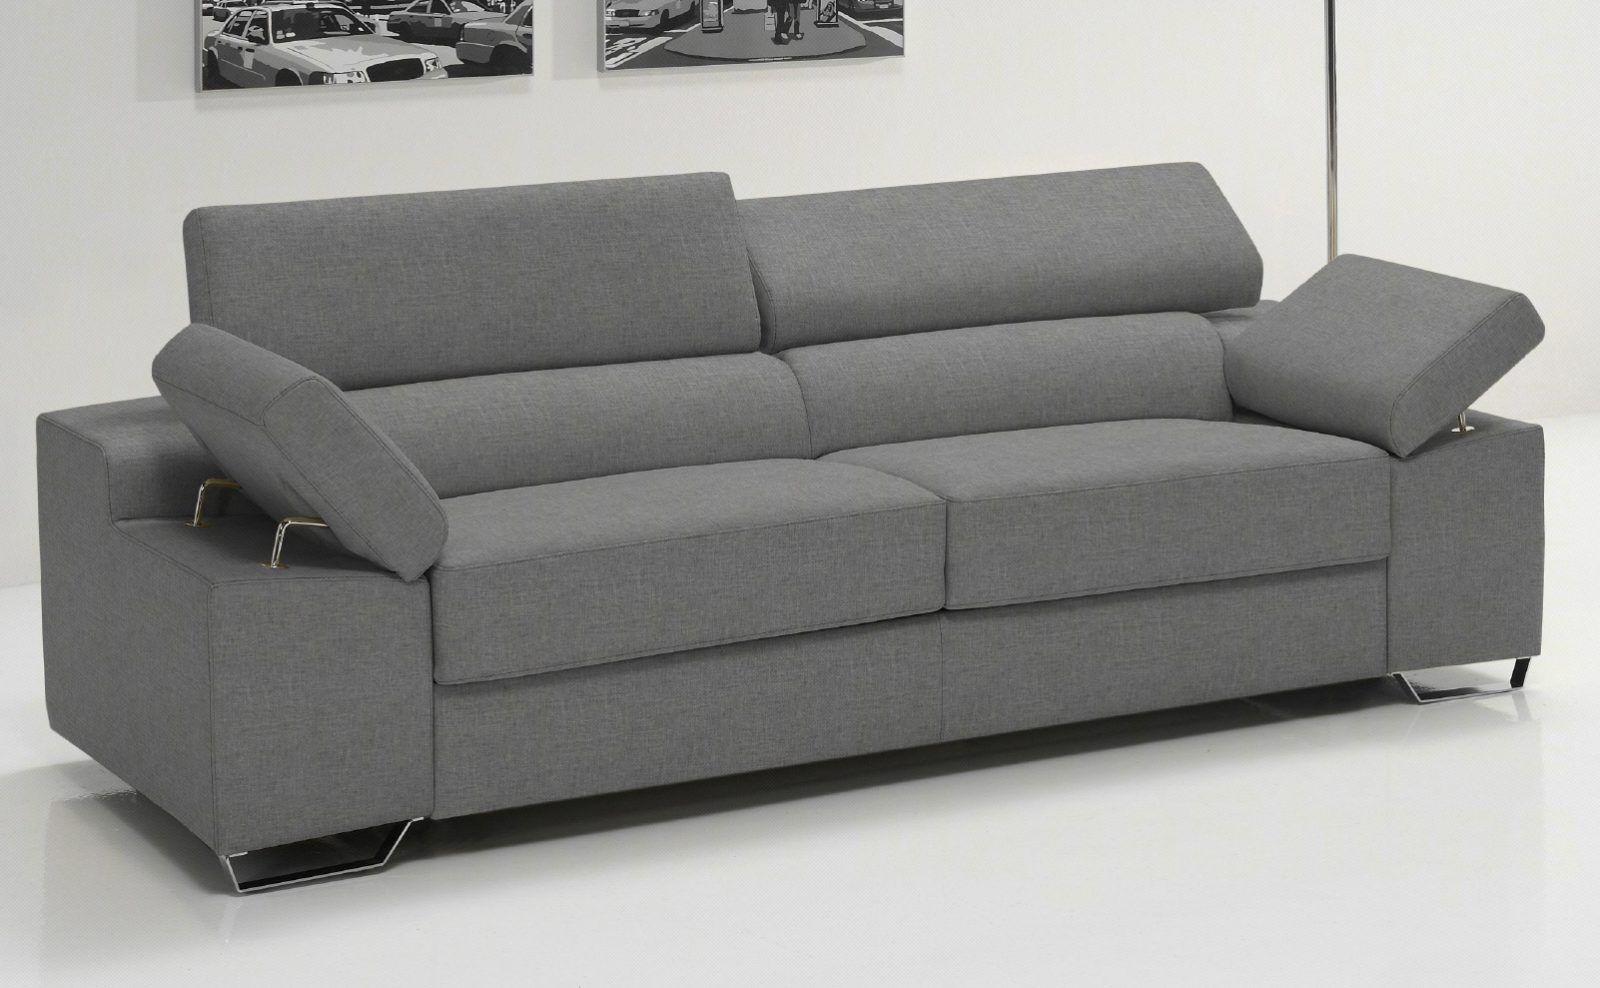 Sof cama estilo italiano muebles sofa couch y home decor for Sofas cama diseno italiano ofertas